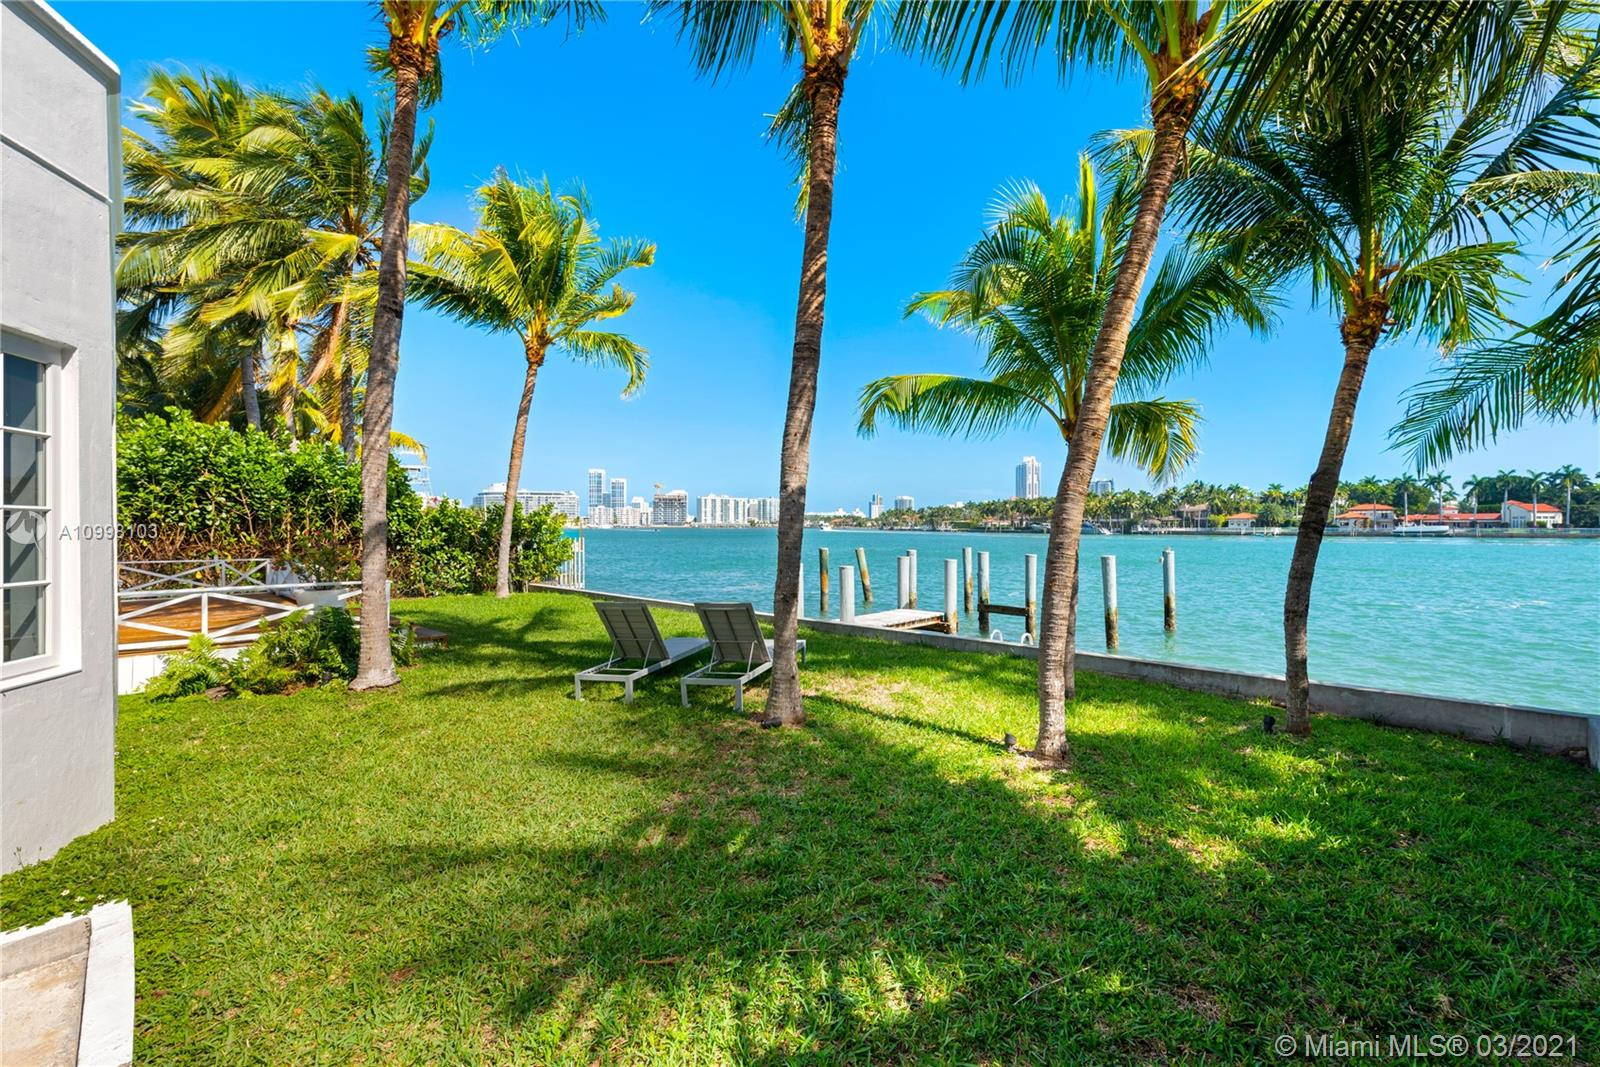 Isle of Normandy - 1500 Bay Dr, Miami Beach, FL 33141